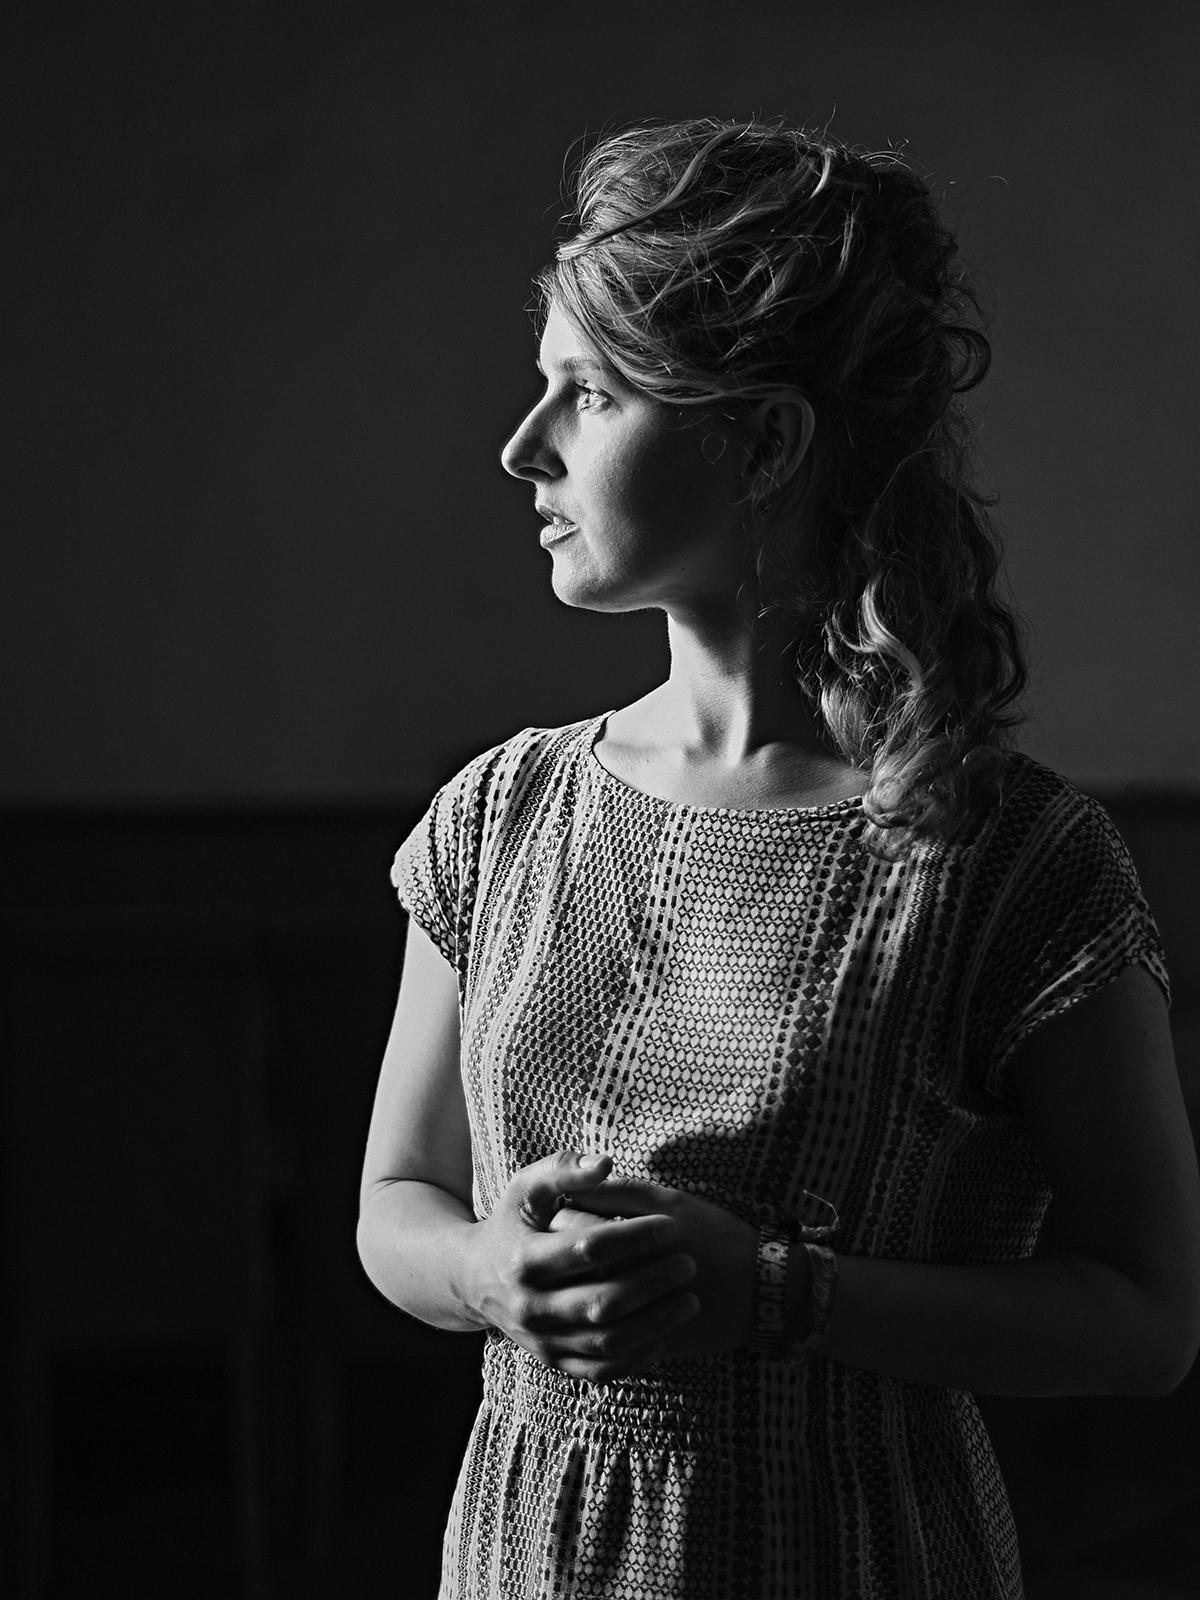 Eske Tibben, alt mezzo soprano